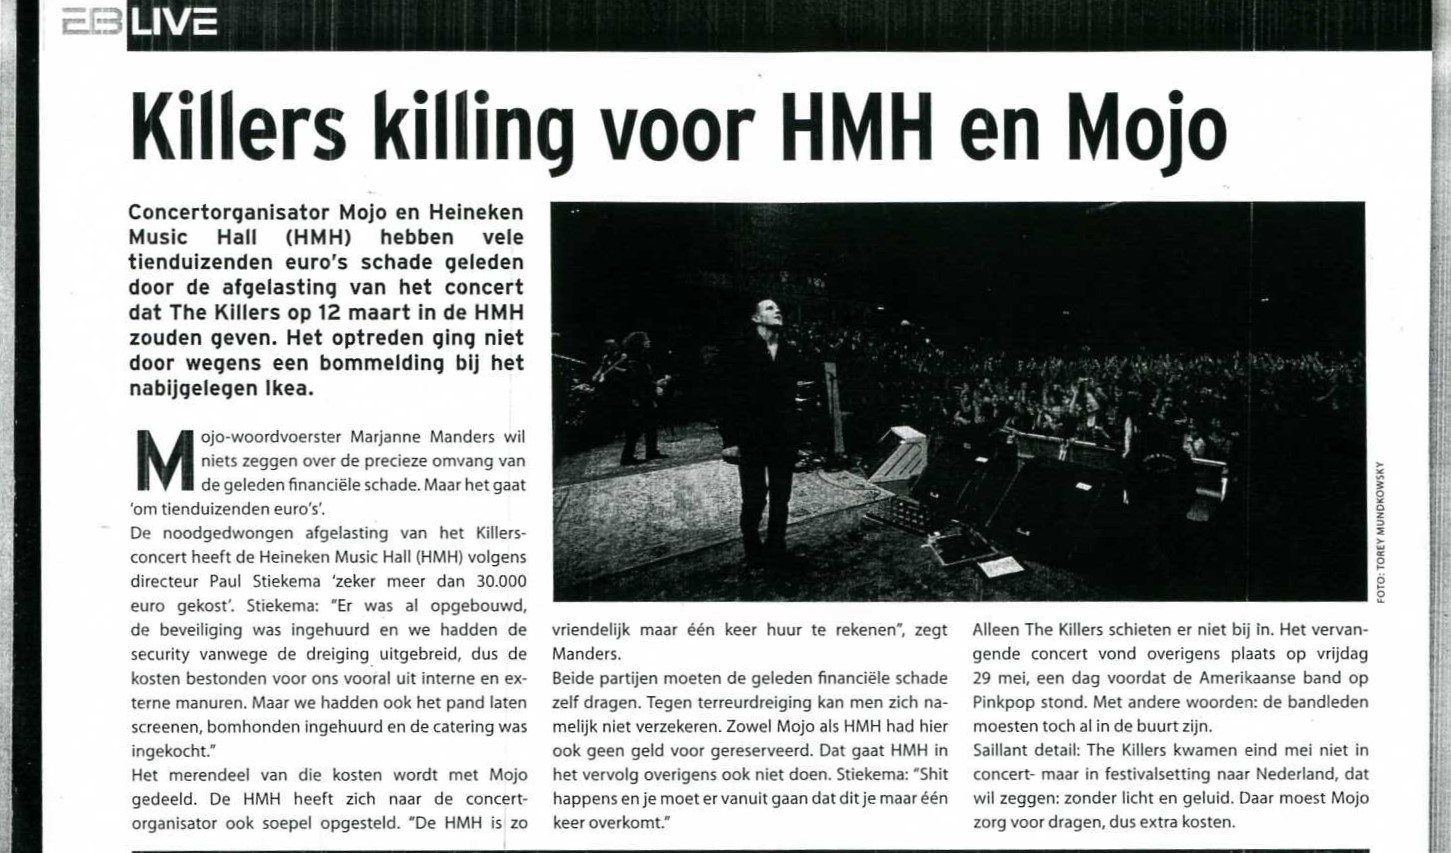 Killers-krantenartikel.jpg#asset:7150